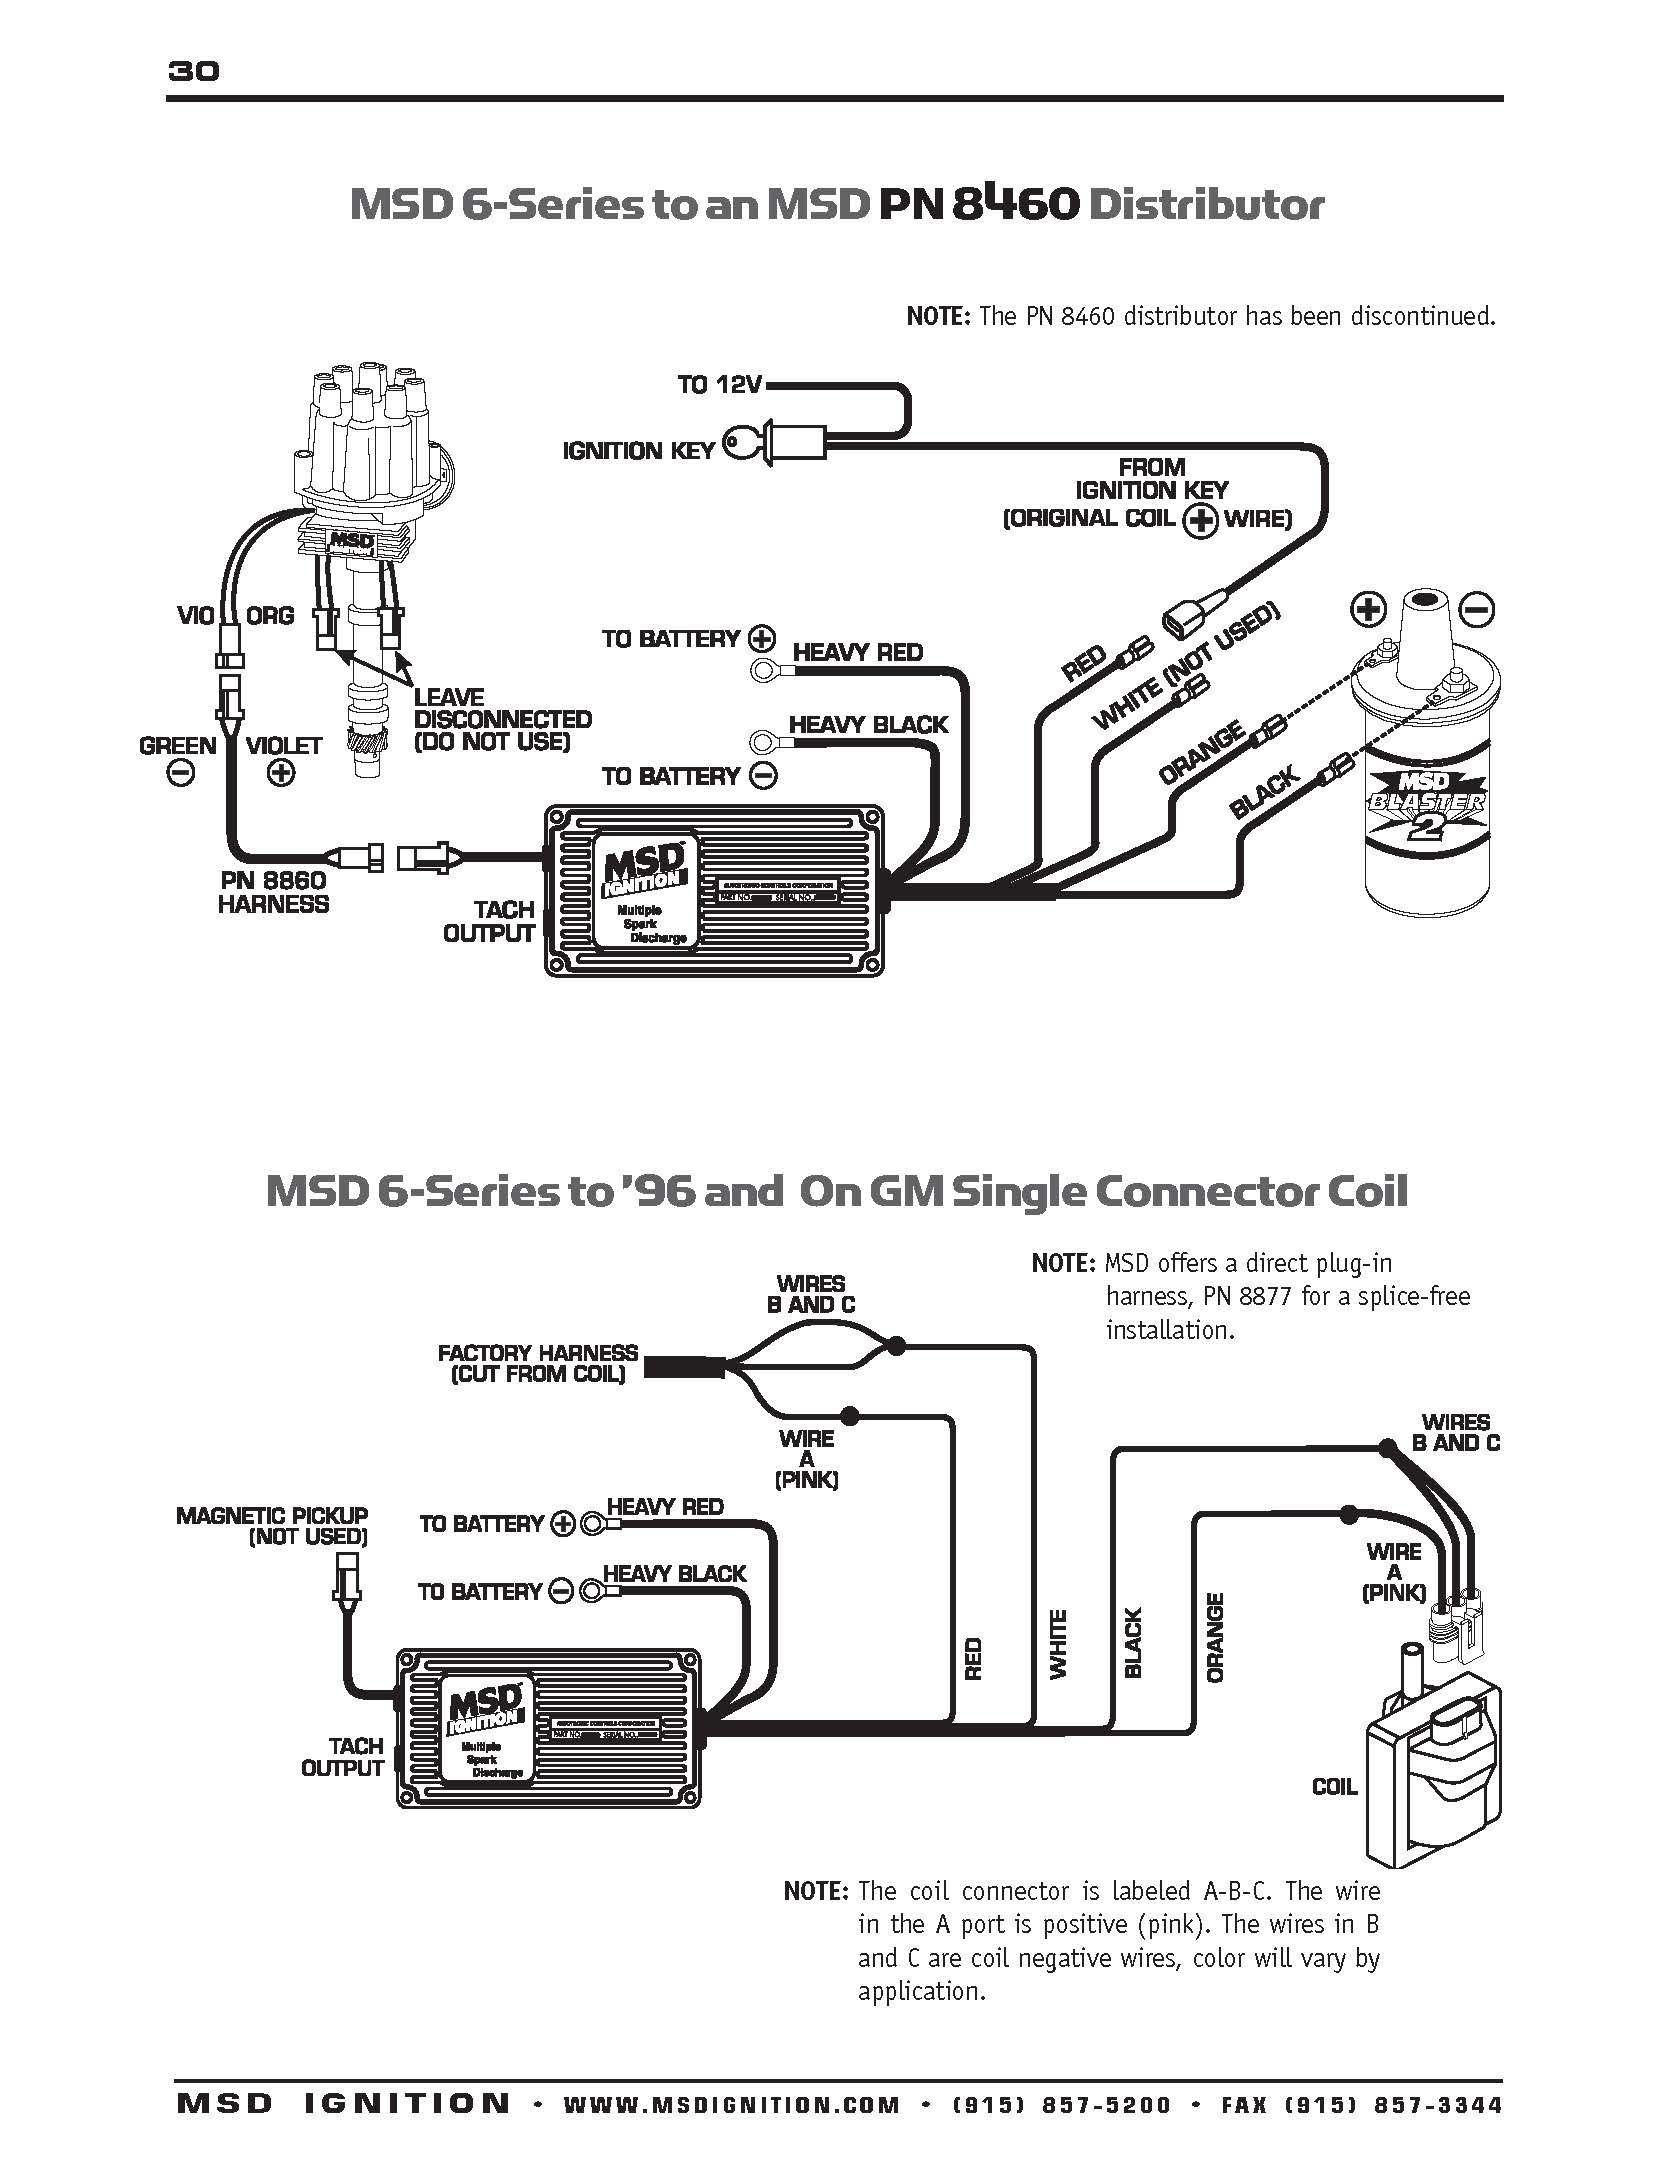 3748201 Unilite Distributor Wiring Diagram Ignition Coil Diagram Msd